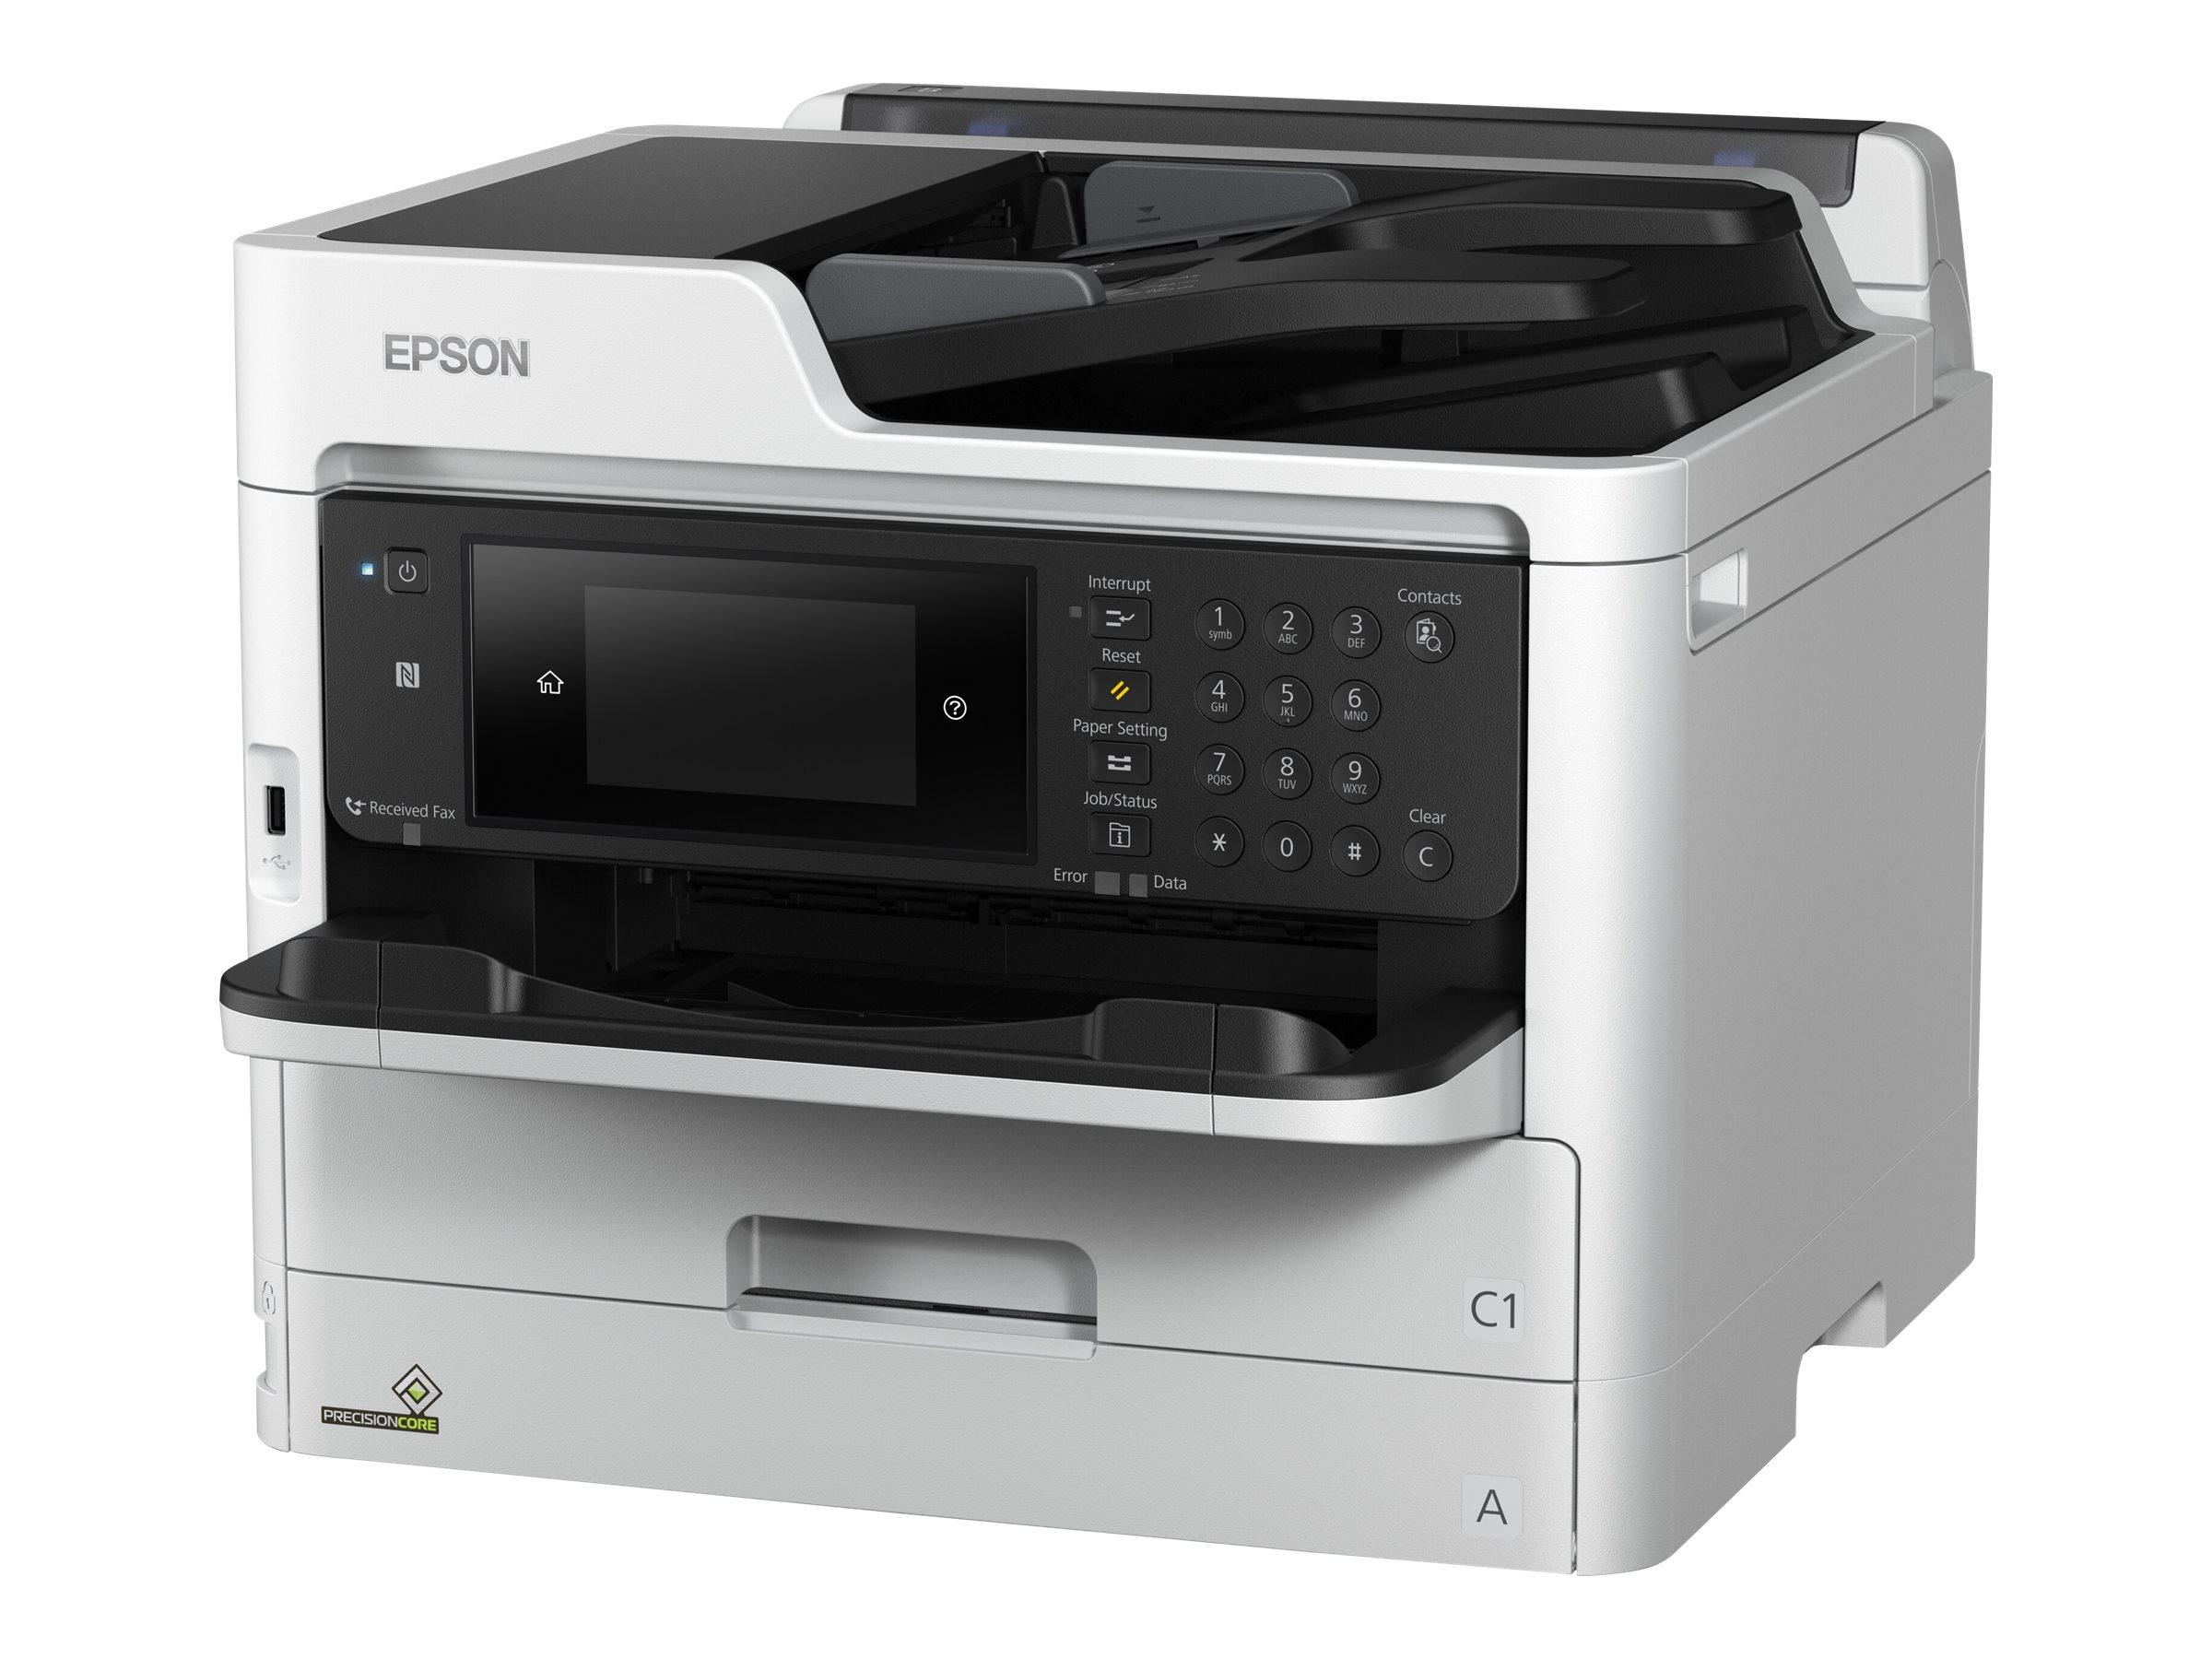 Epson WorkForce Pro WF-M5799DWF - Multifunktionsdrucker - s/w - Tintenstrahl - A4 (210 x 297 mm) (Original) - A4/Legal (Medien)